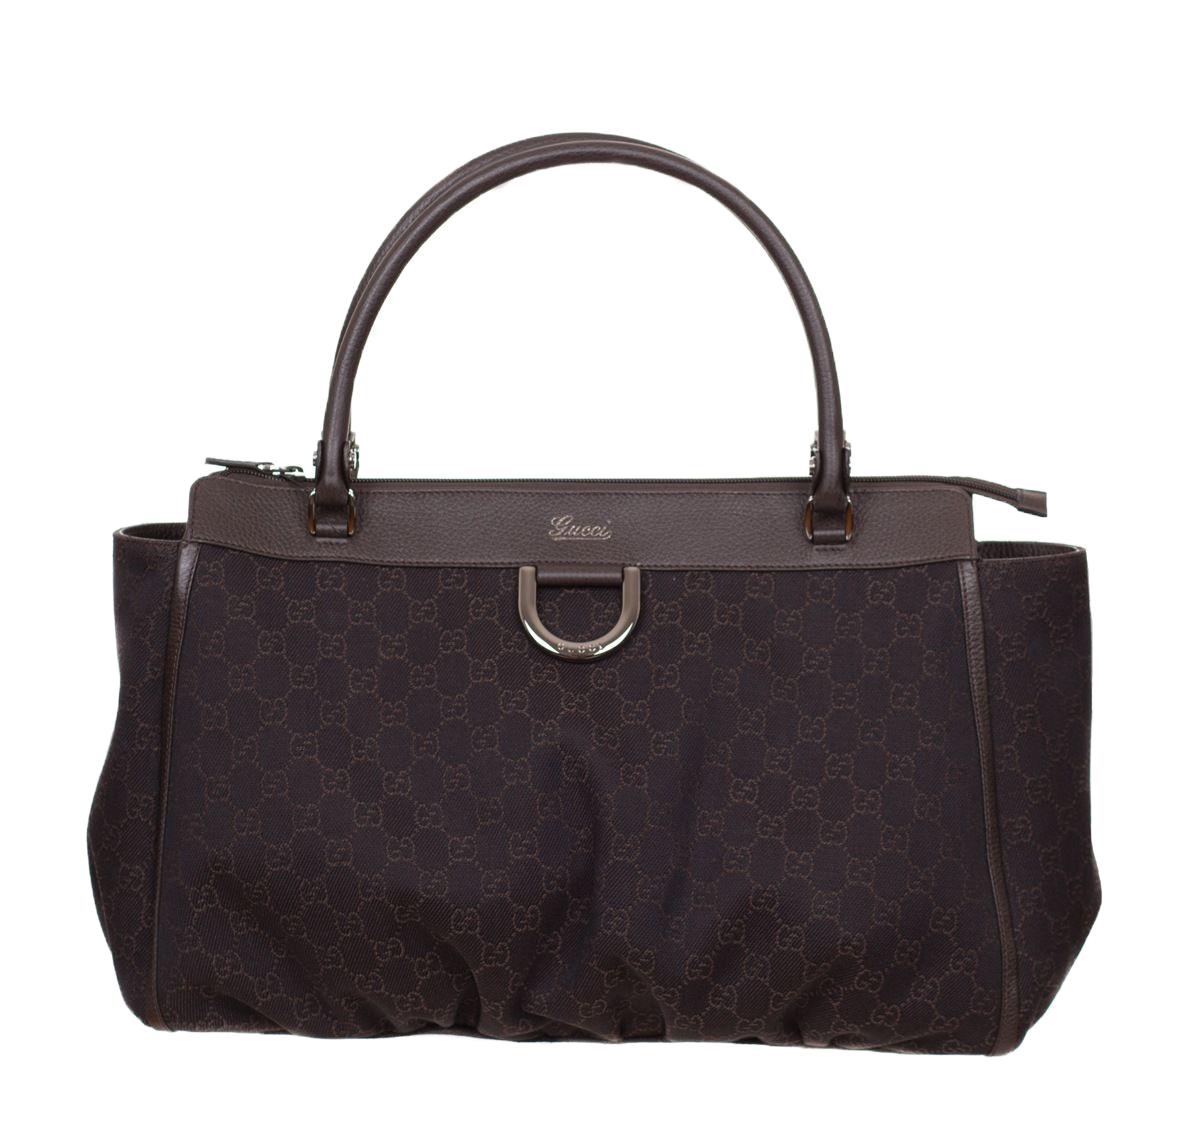 73fea9e6417 Gucci Monogram GG Large Brown Handbag Purse